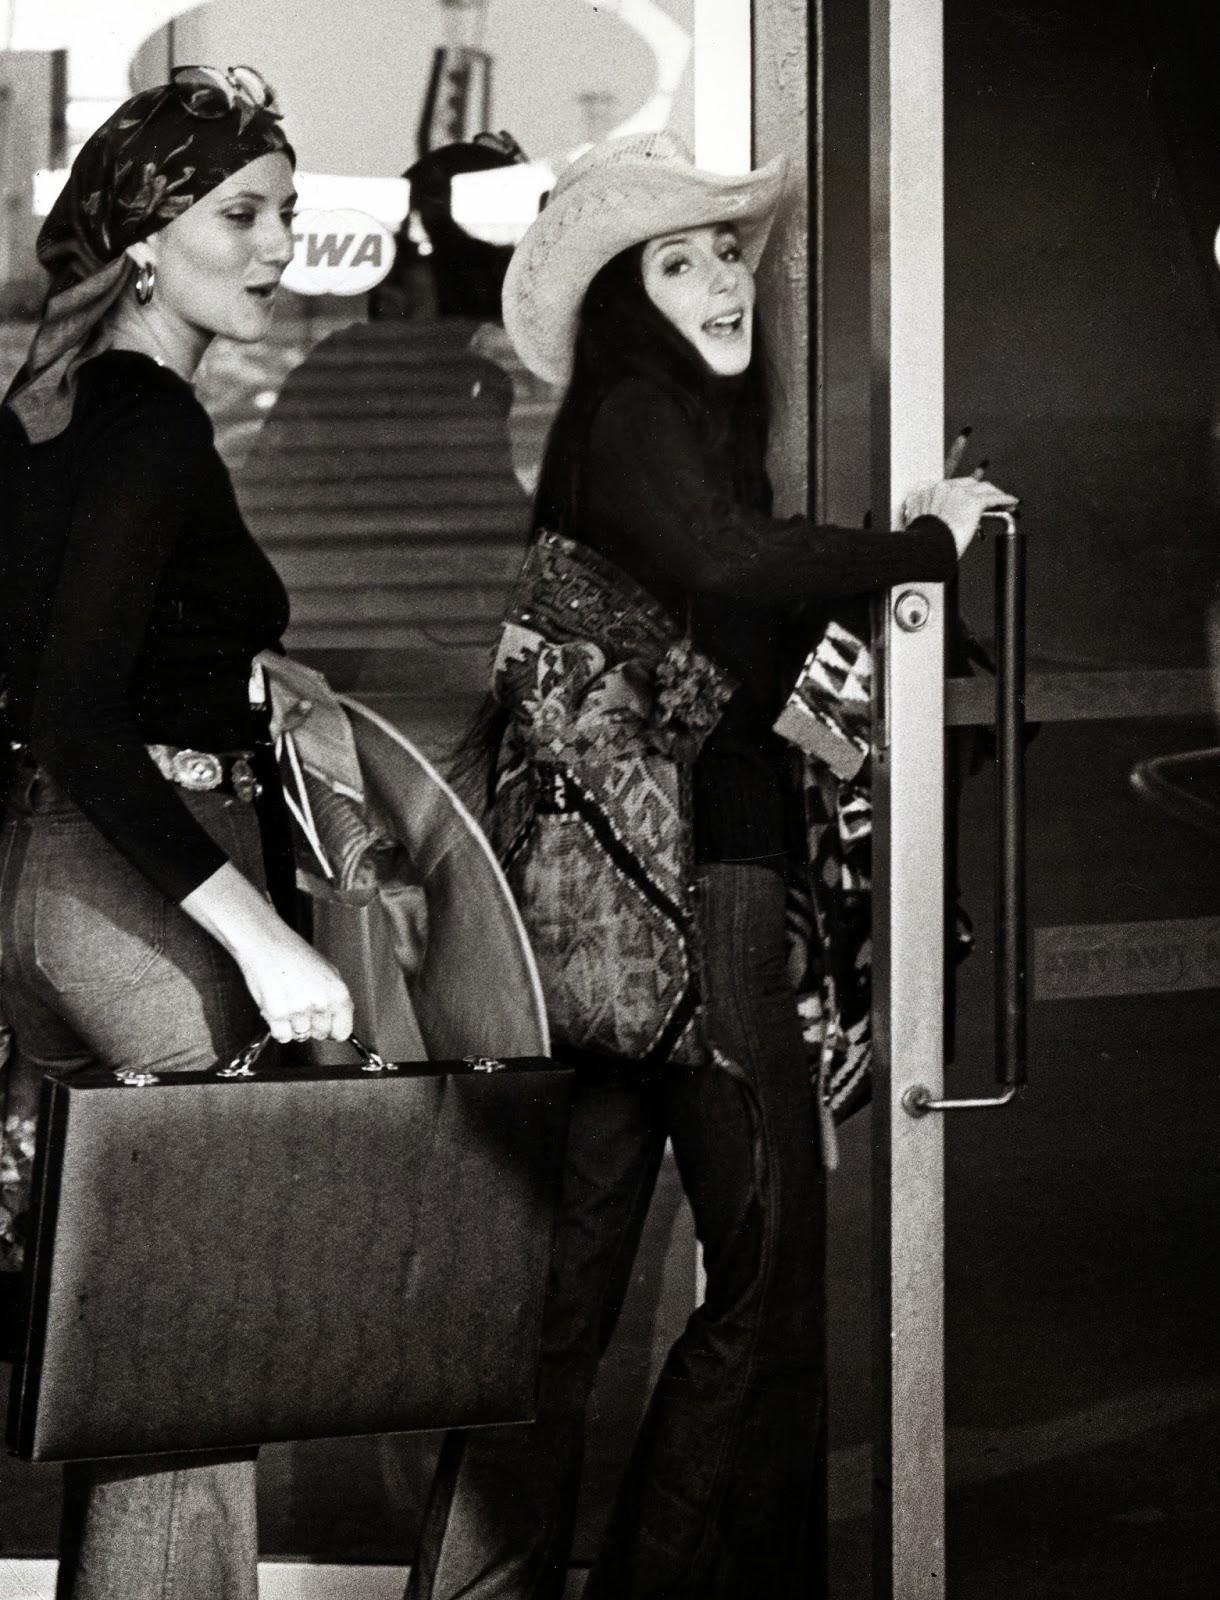 Airport-Celebs-Cher-JFK-1974